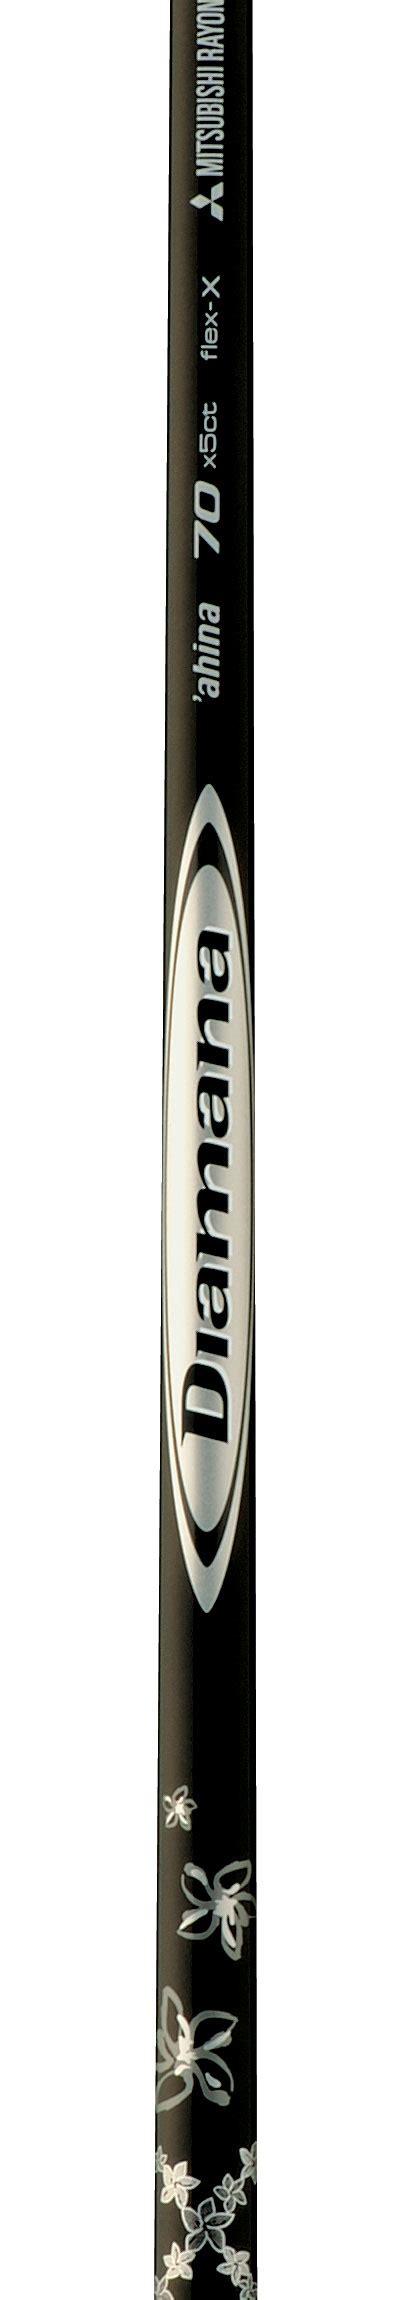 diamana whiteboard swing speed 2011 buyer s guide shafts golf tips magazine